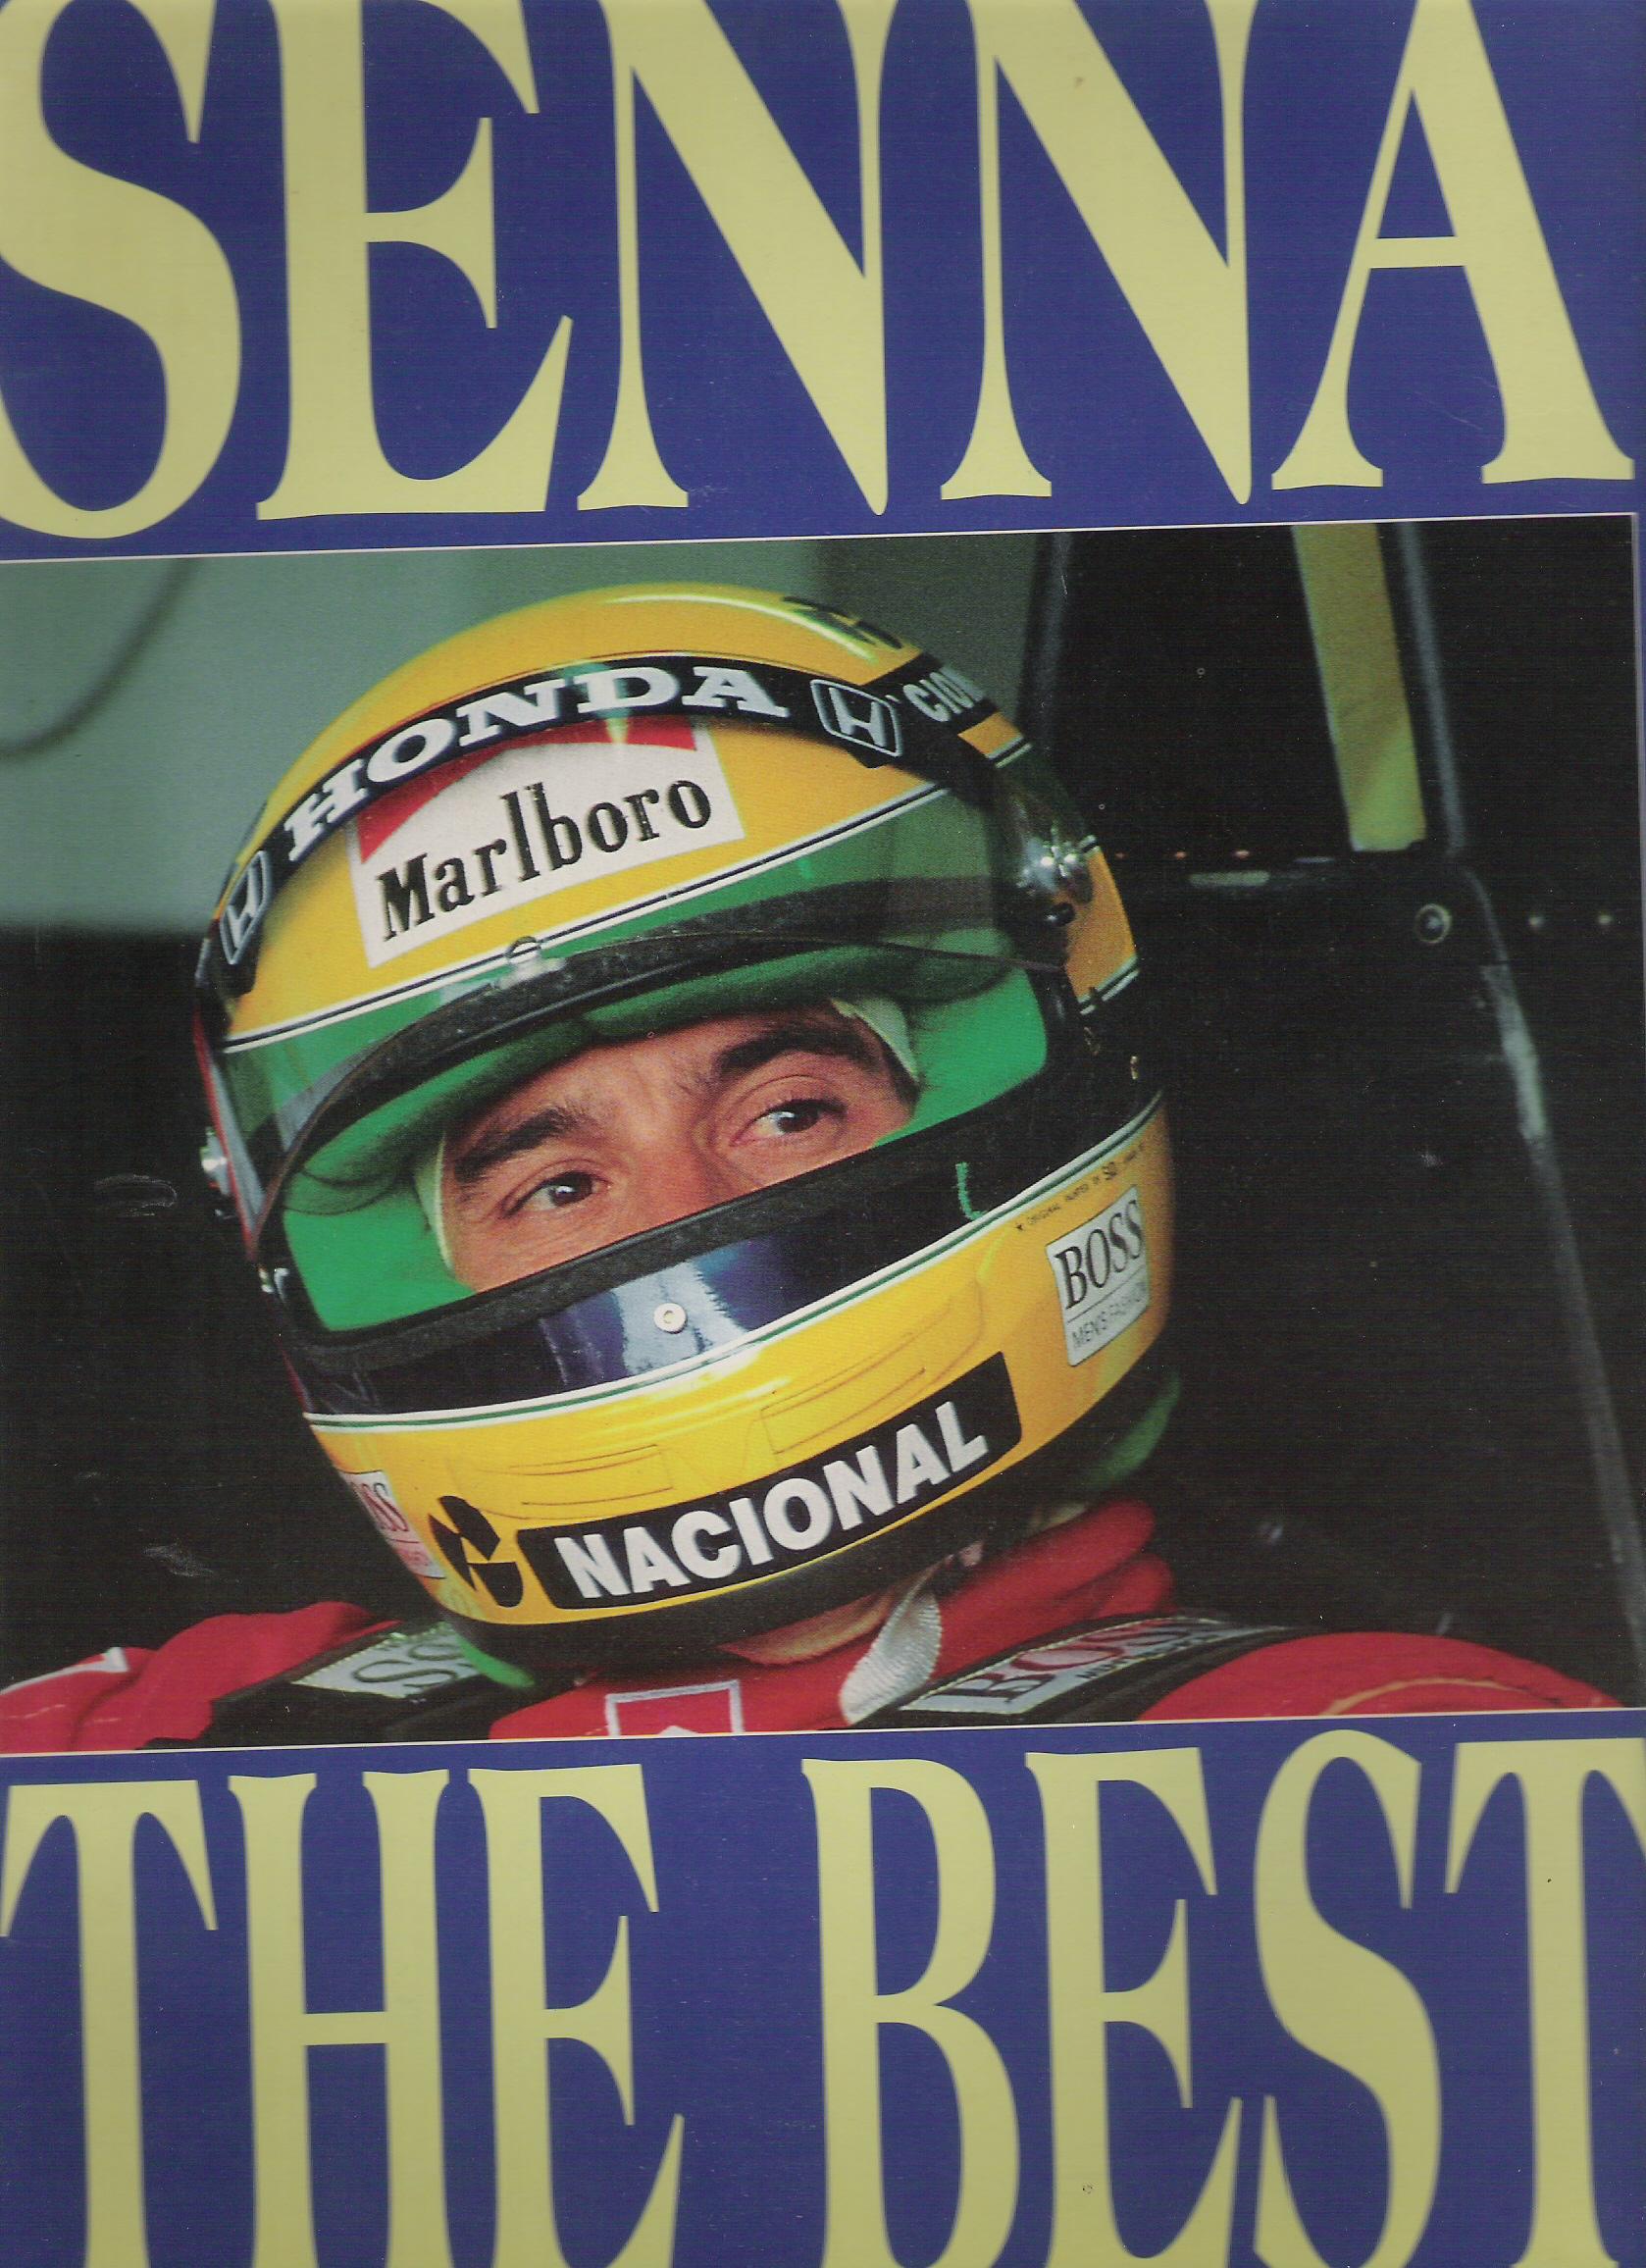 Senna the best